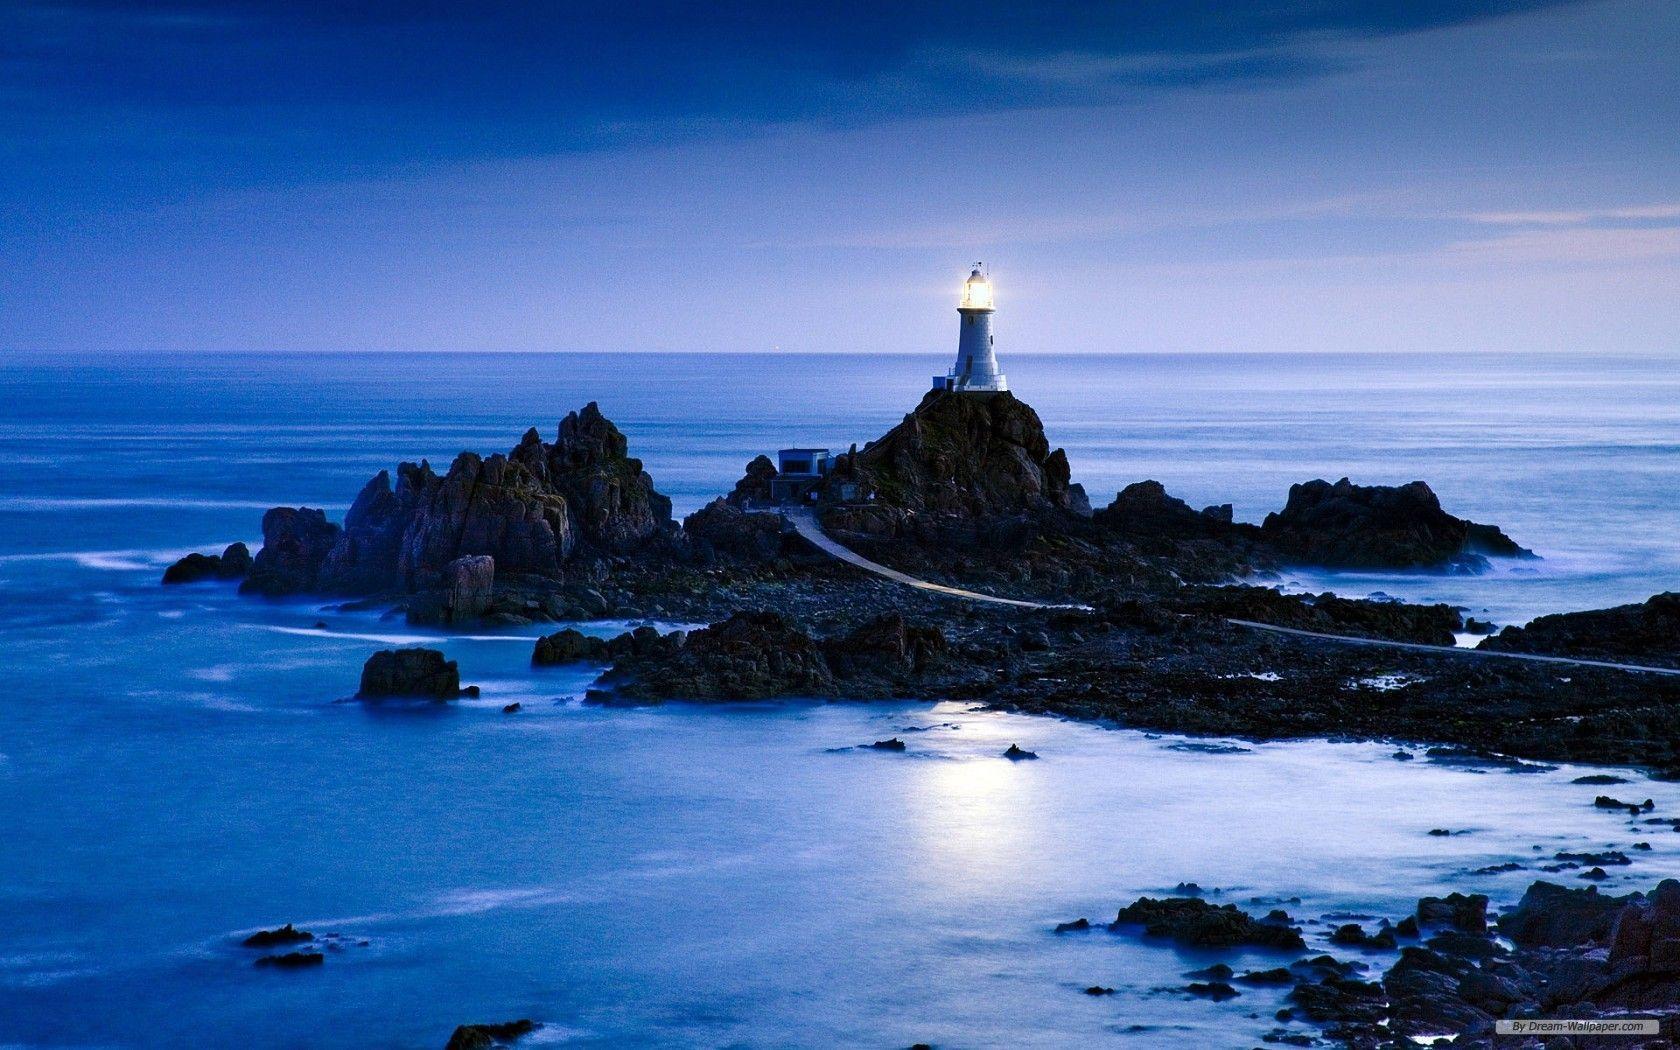 Windows 7 Lighthouse Wallpaper - Windows 7 Lighthouse Live Images ...